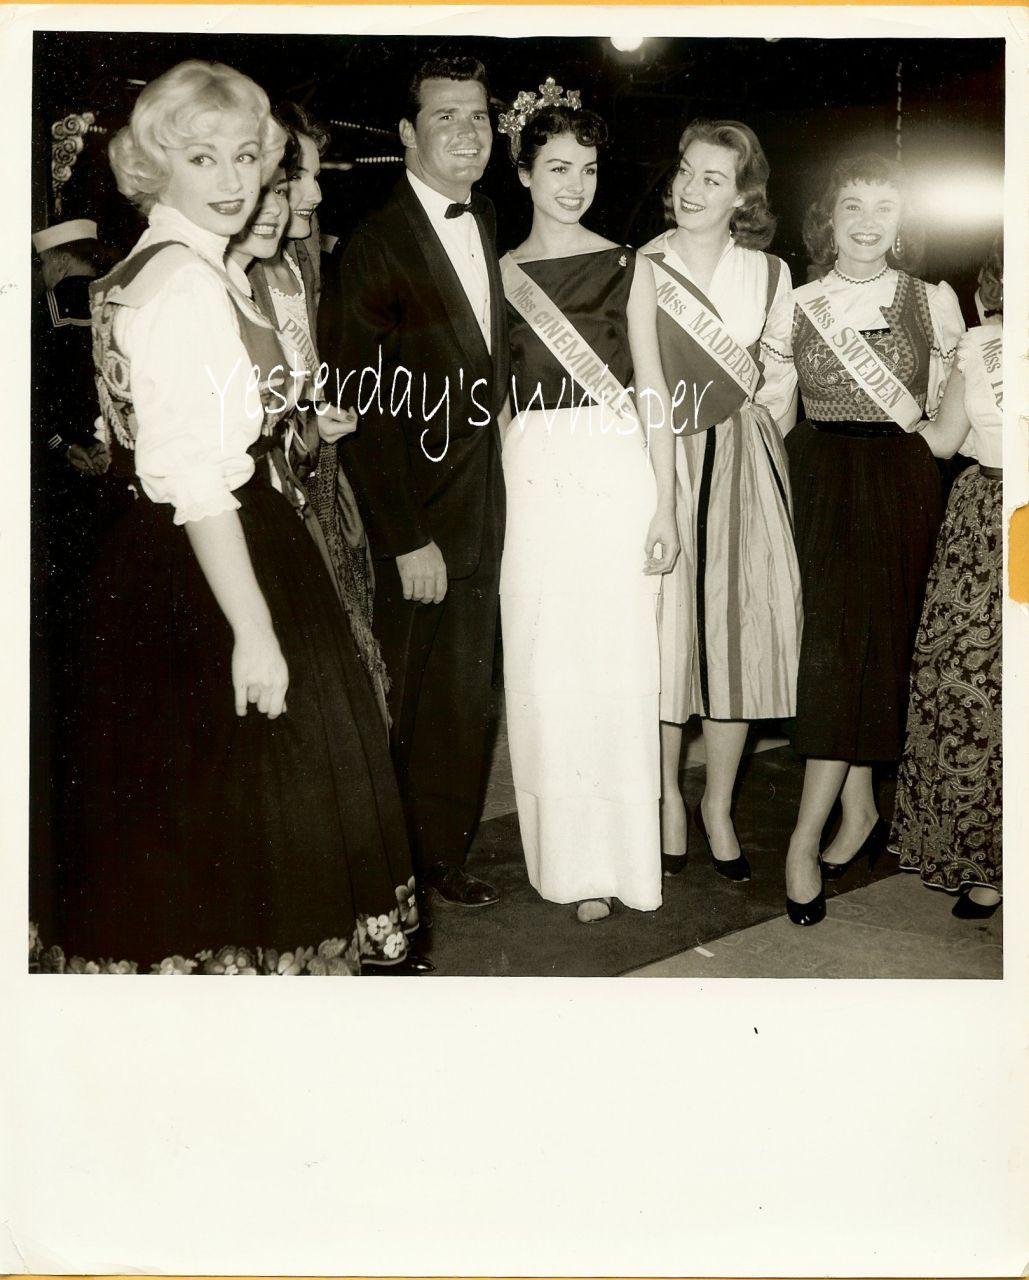 James Garner Miss Cinemiracle Pageant Beauties Photo